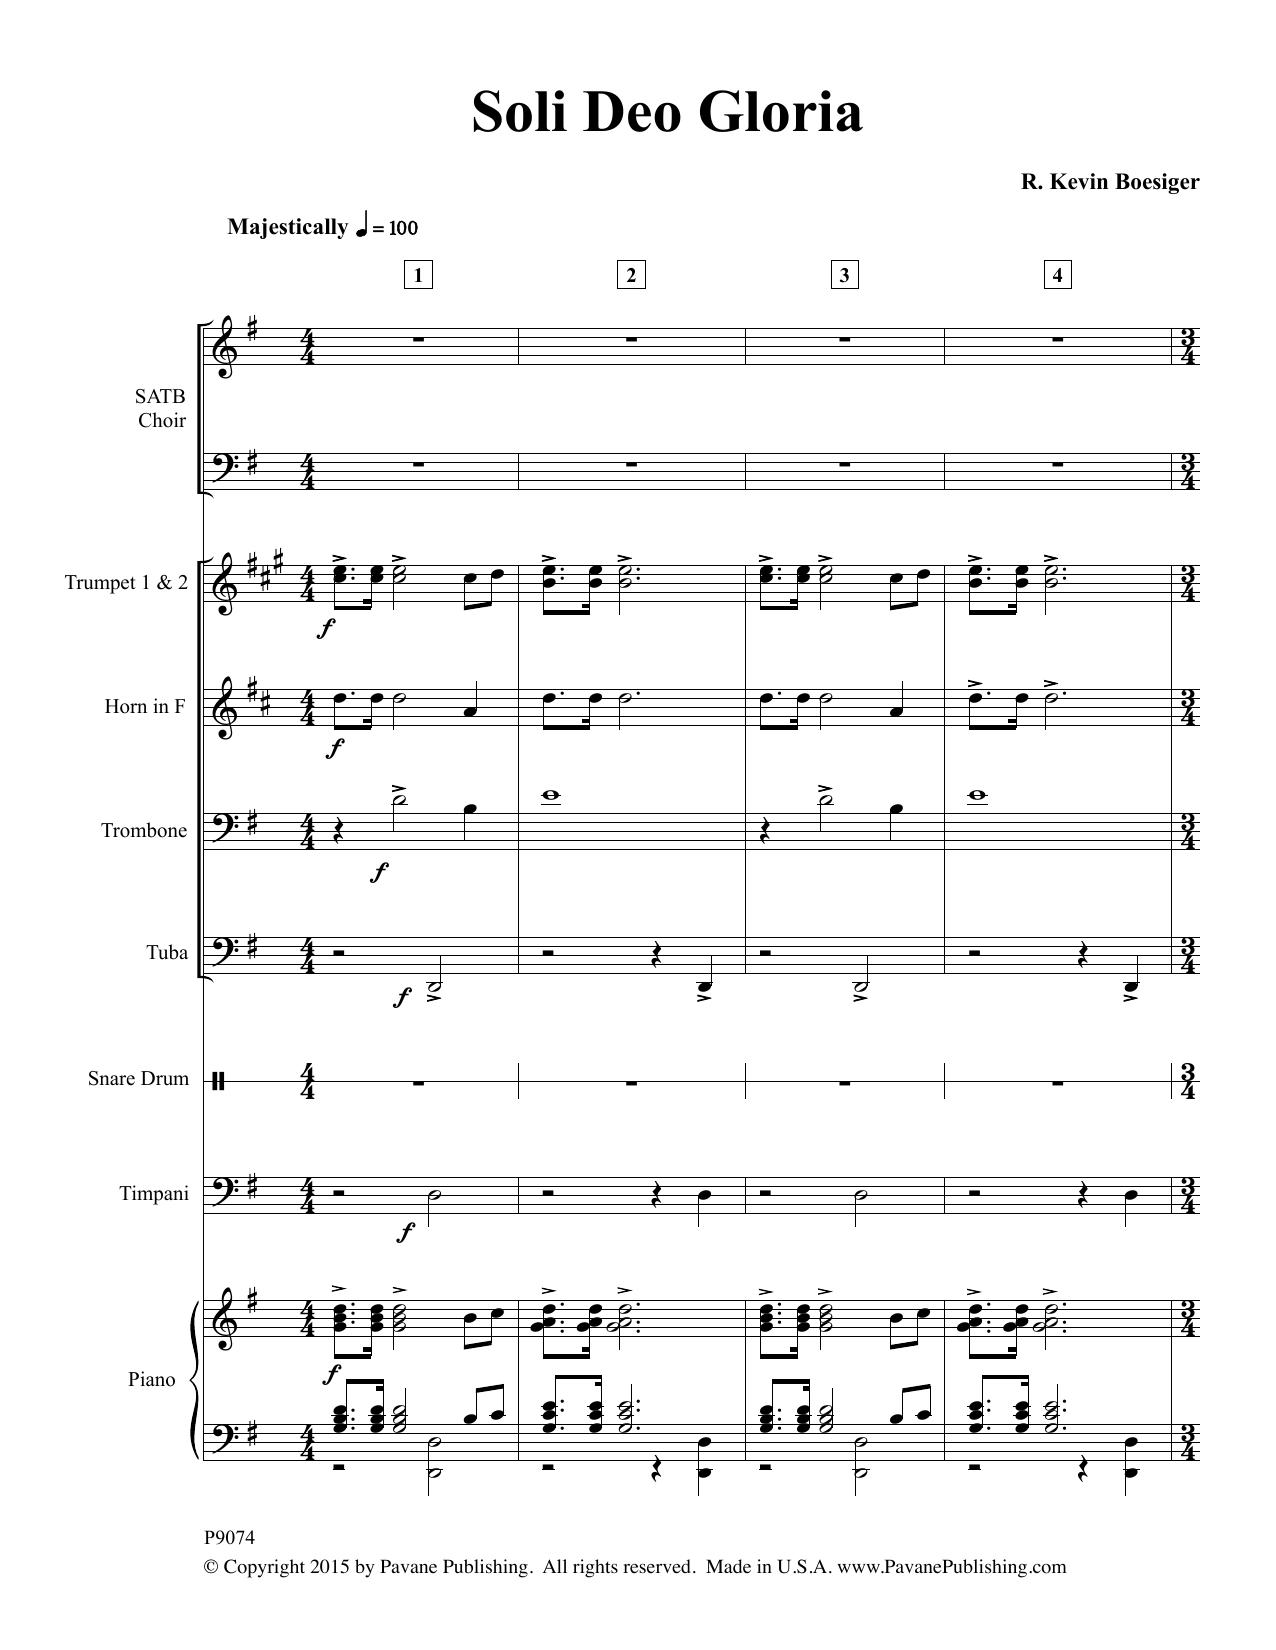 Soli Deo Gloria - Full Score